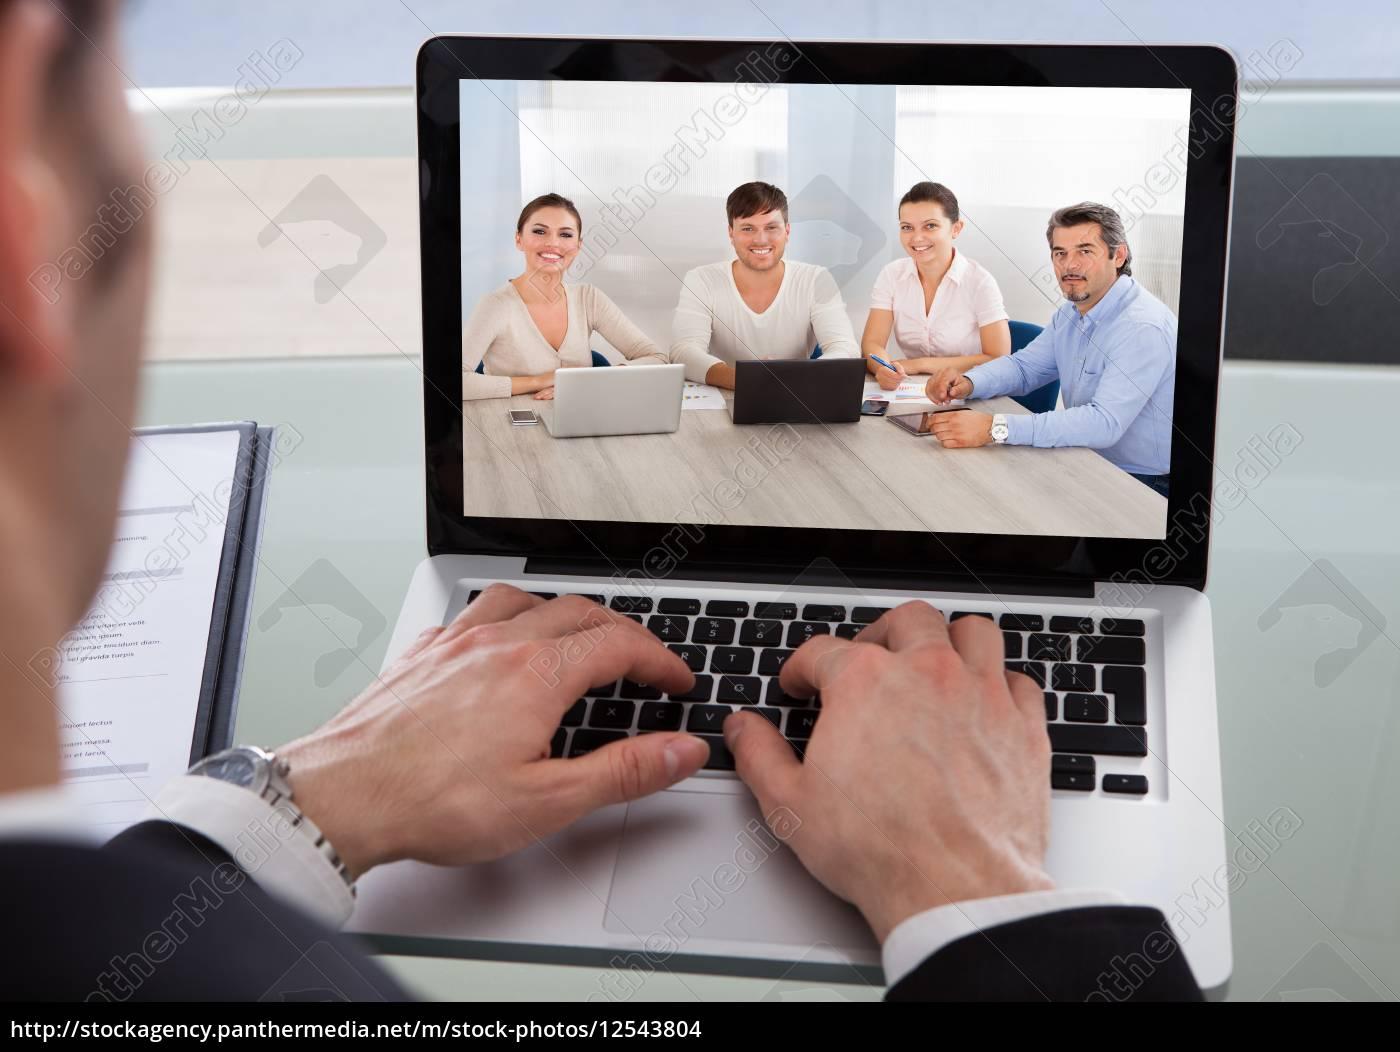 cropped, image, of, businessman, using, laptop - 12543804